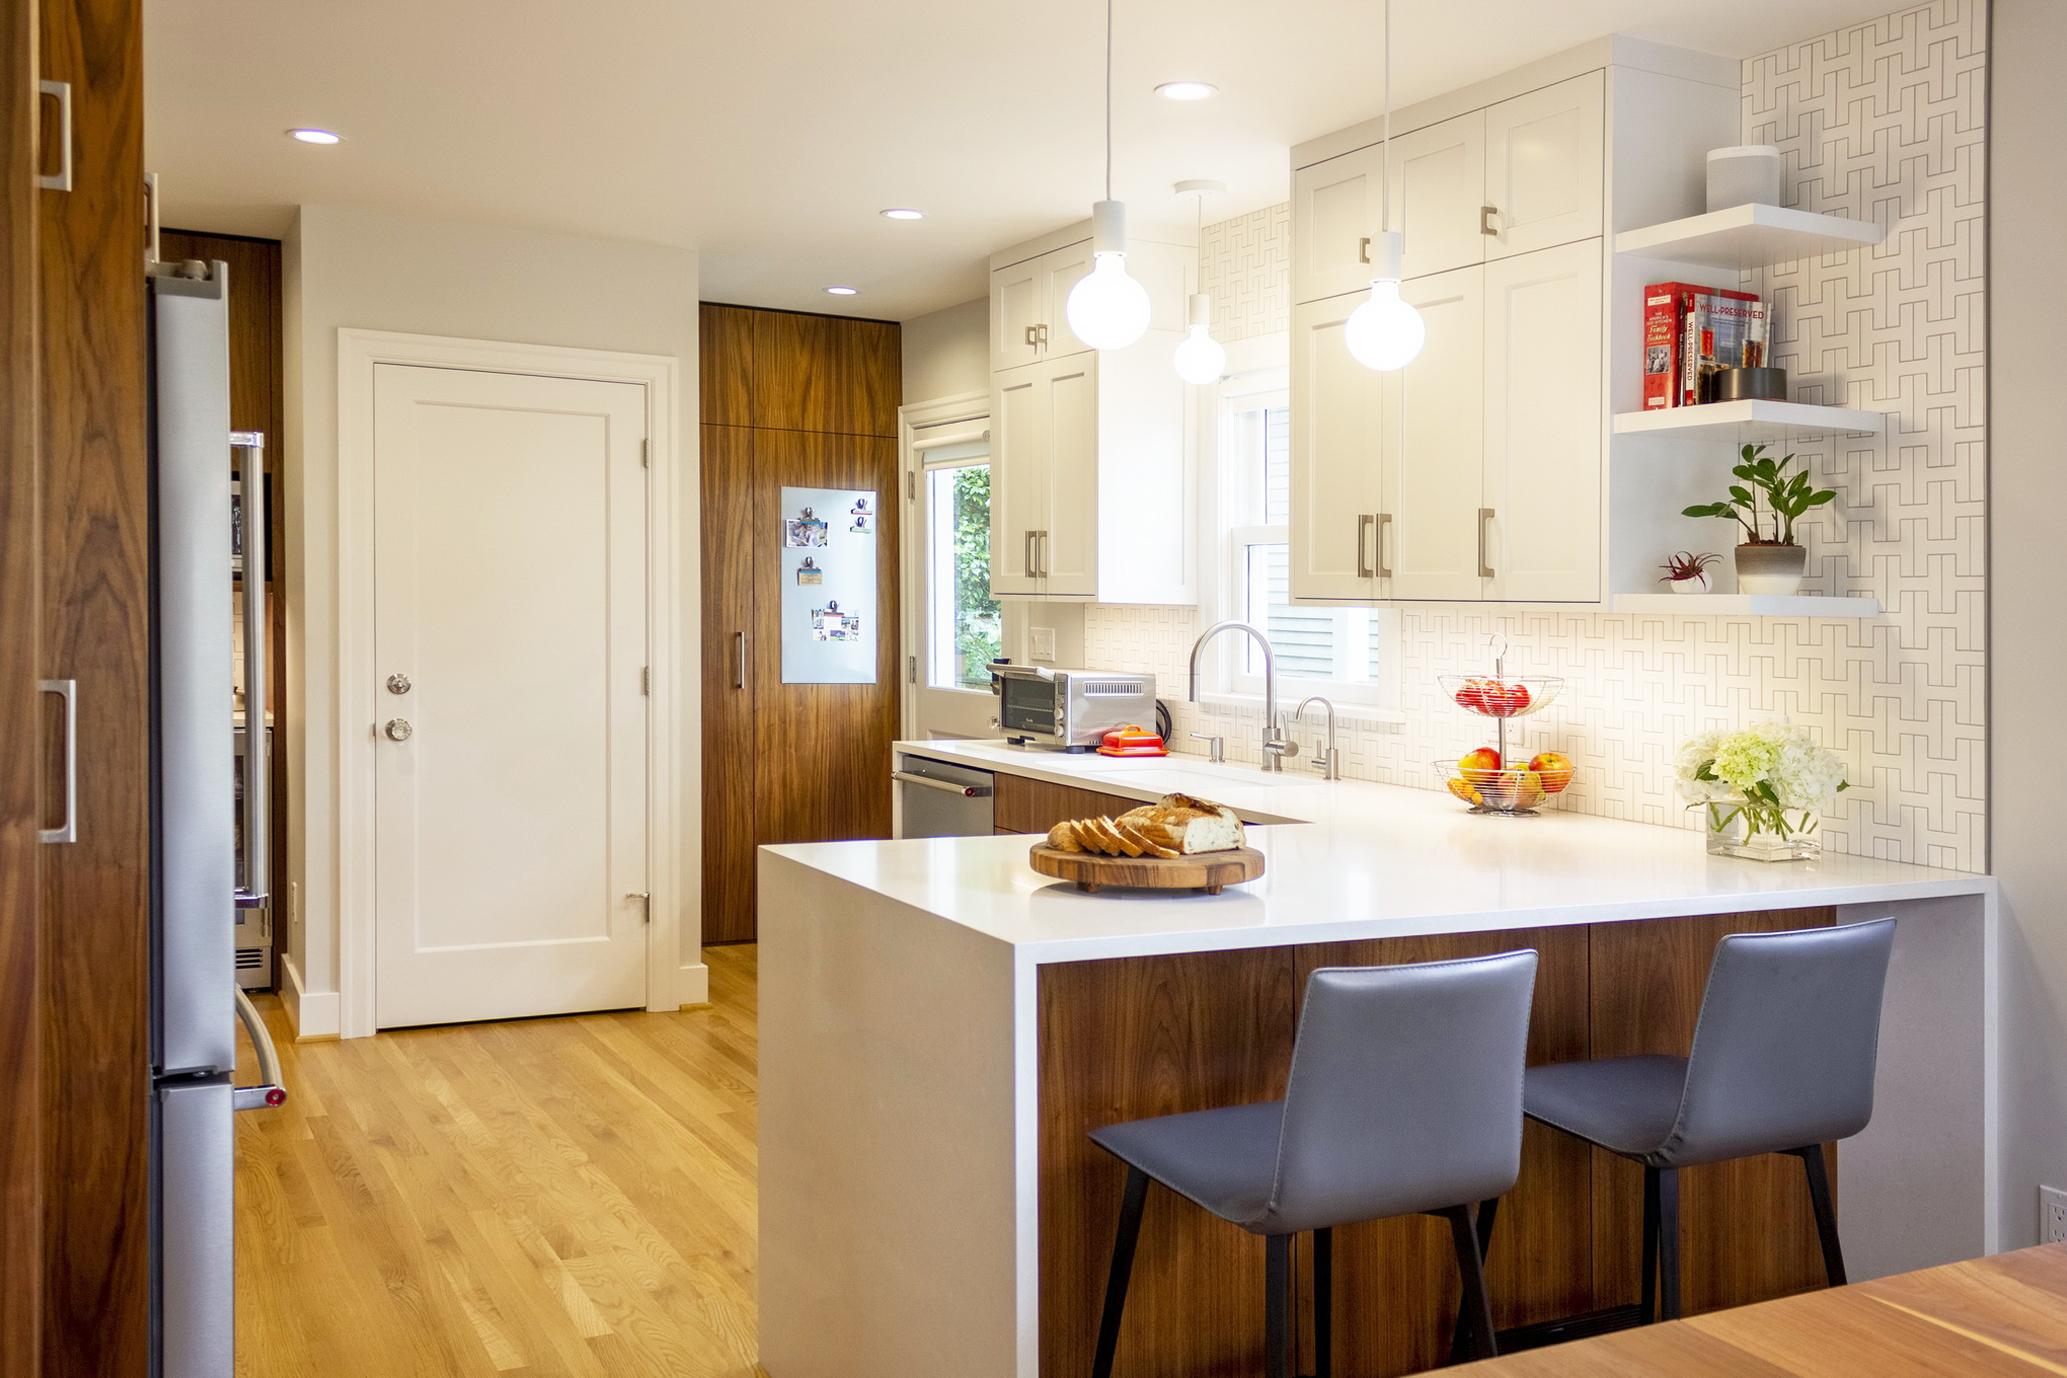 Seattle_Kitchen_Remodel-02